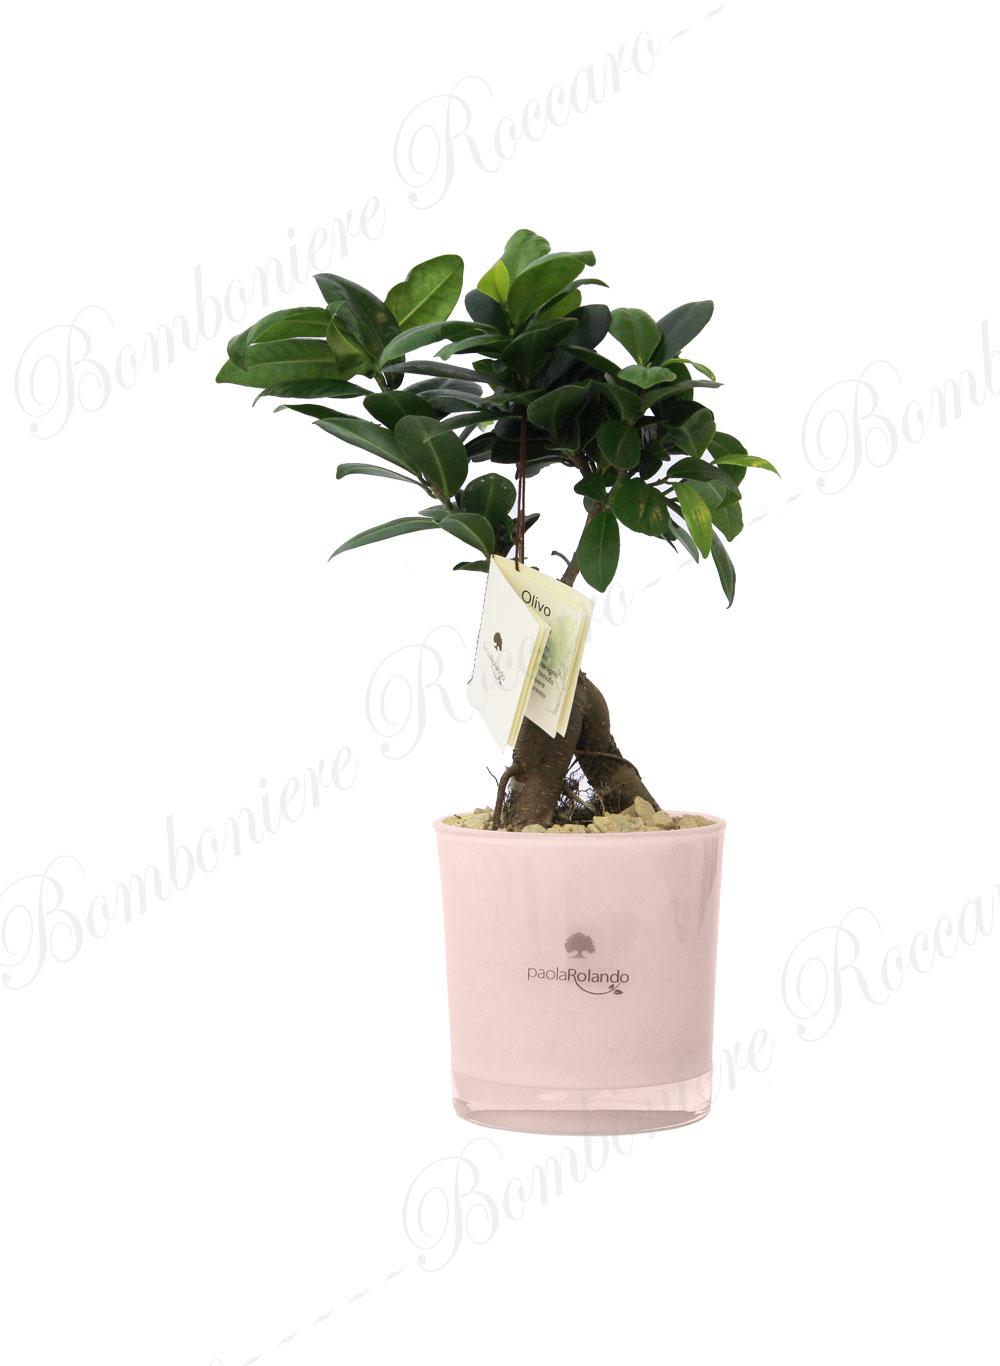 Bonsai ginseng linea sogno bomboniere roccaro for Vasi per bonsai prezzi